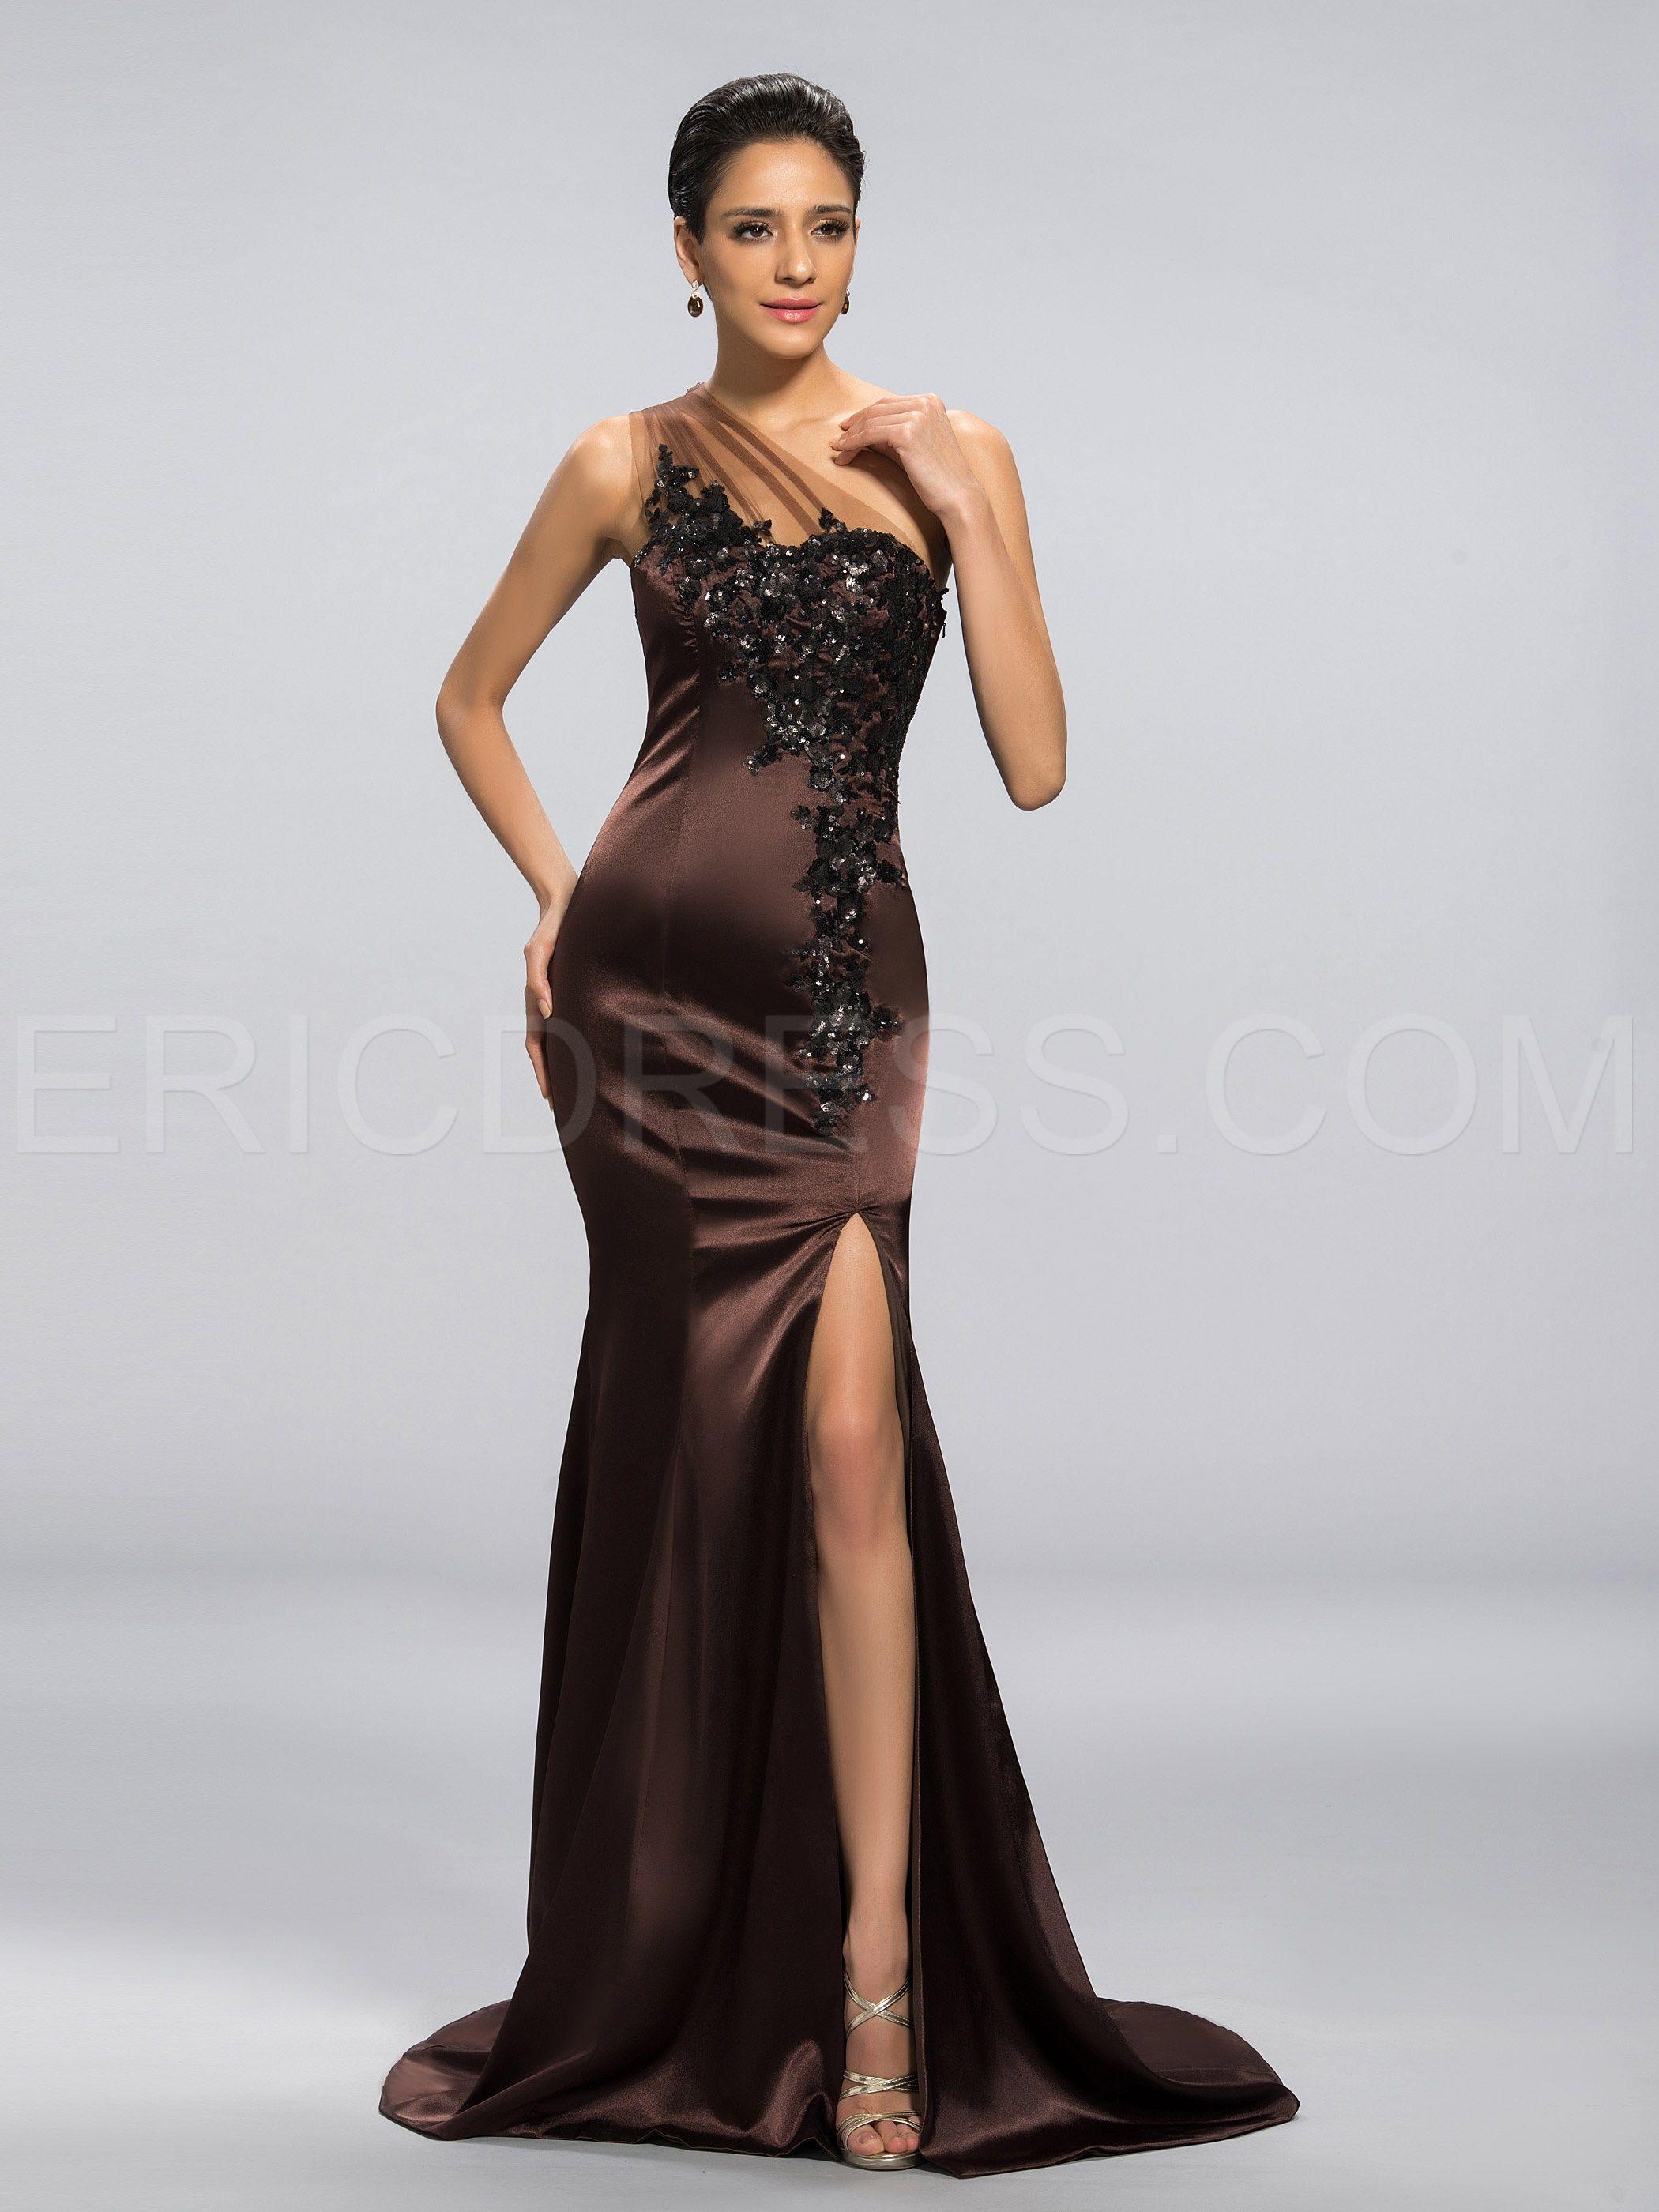 NiСЂС–РІВ±os vestidos elegantes